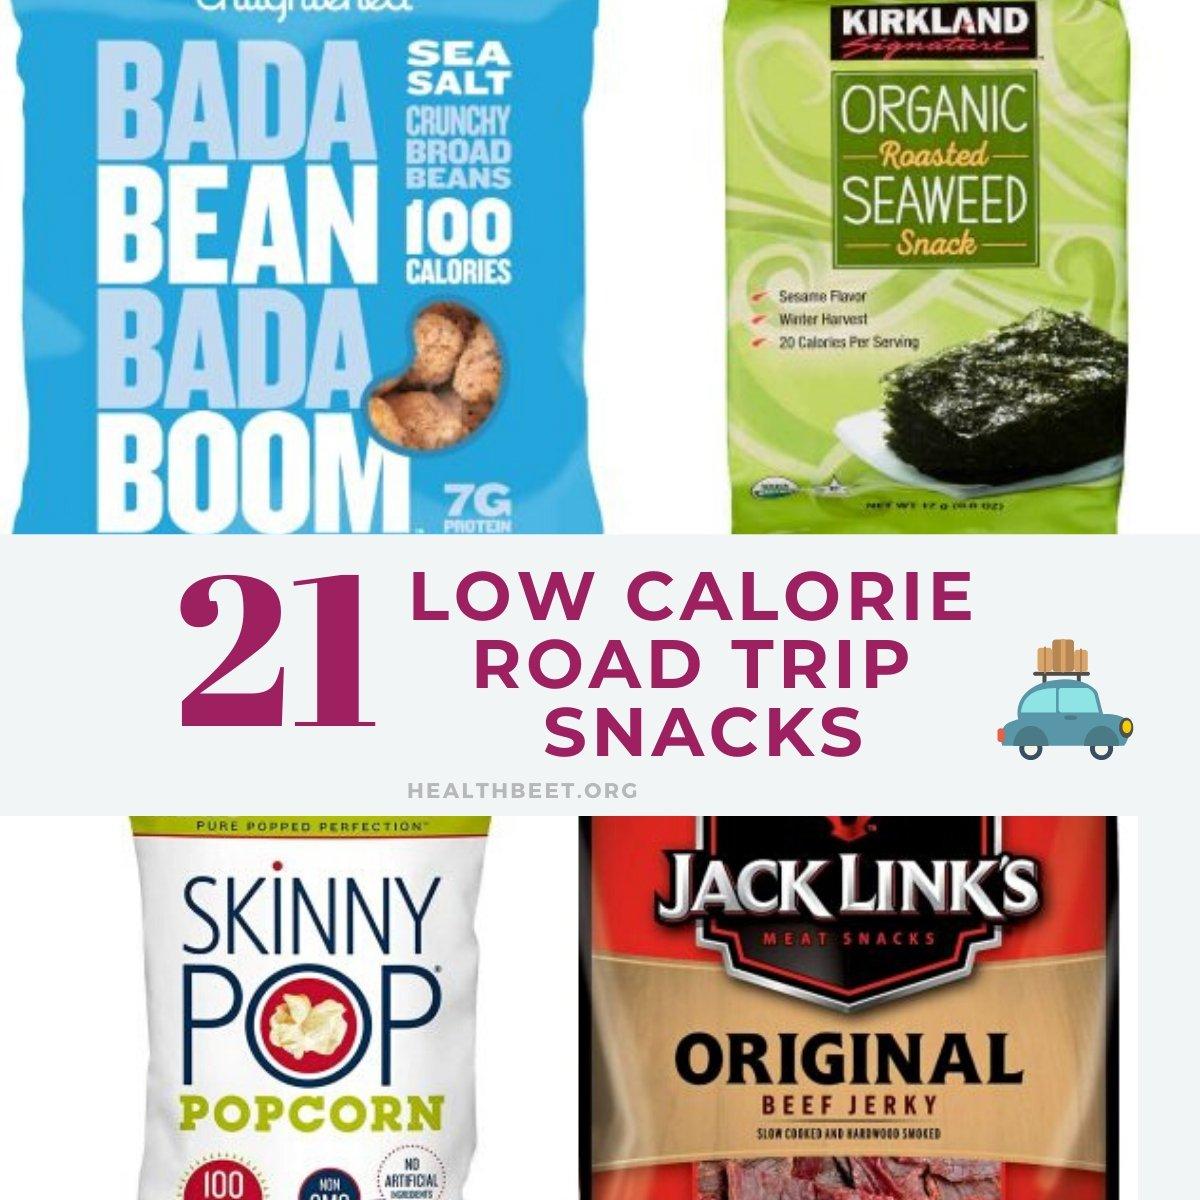 21 low calorie road trip snacks